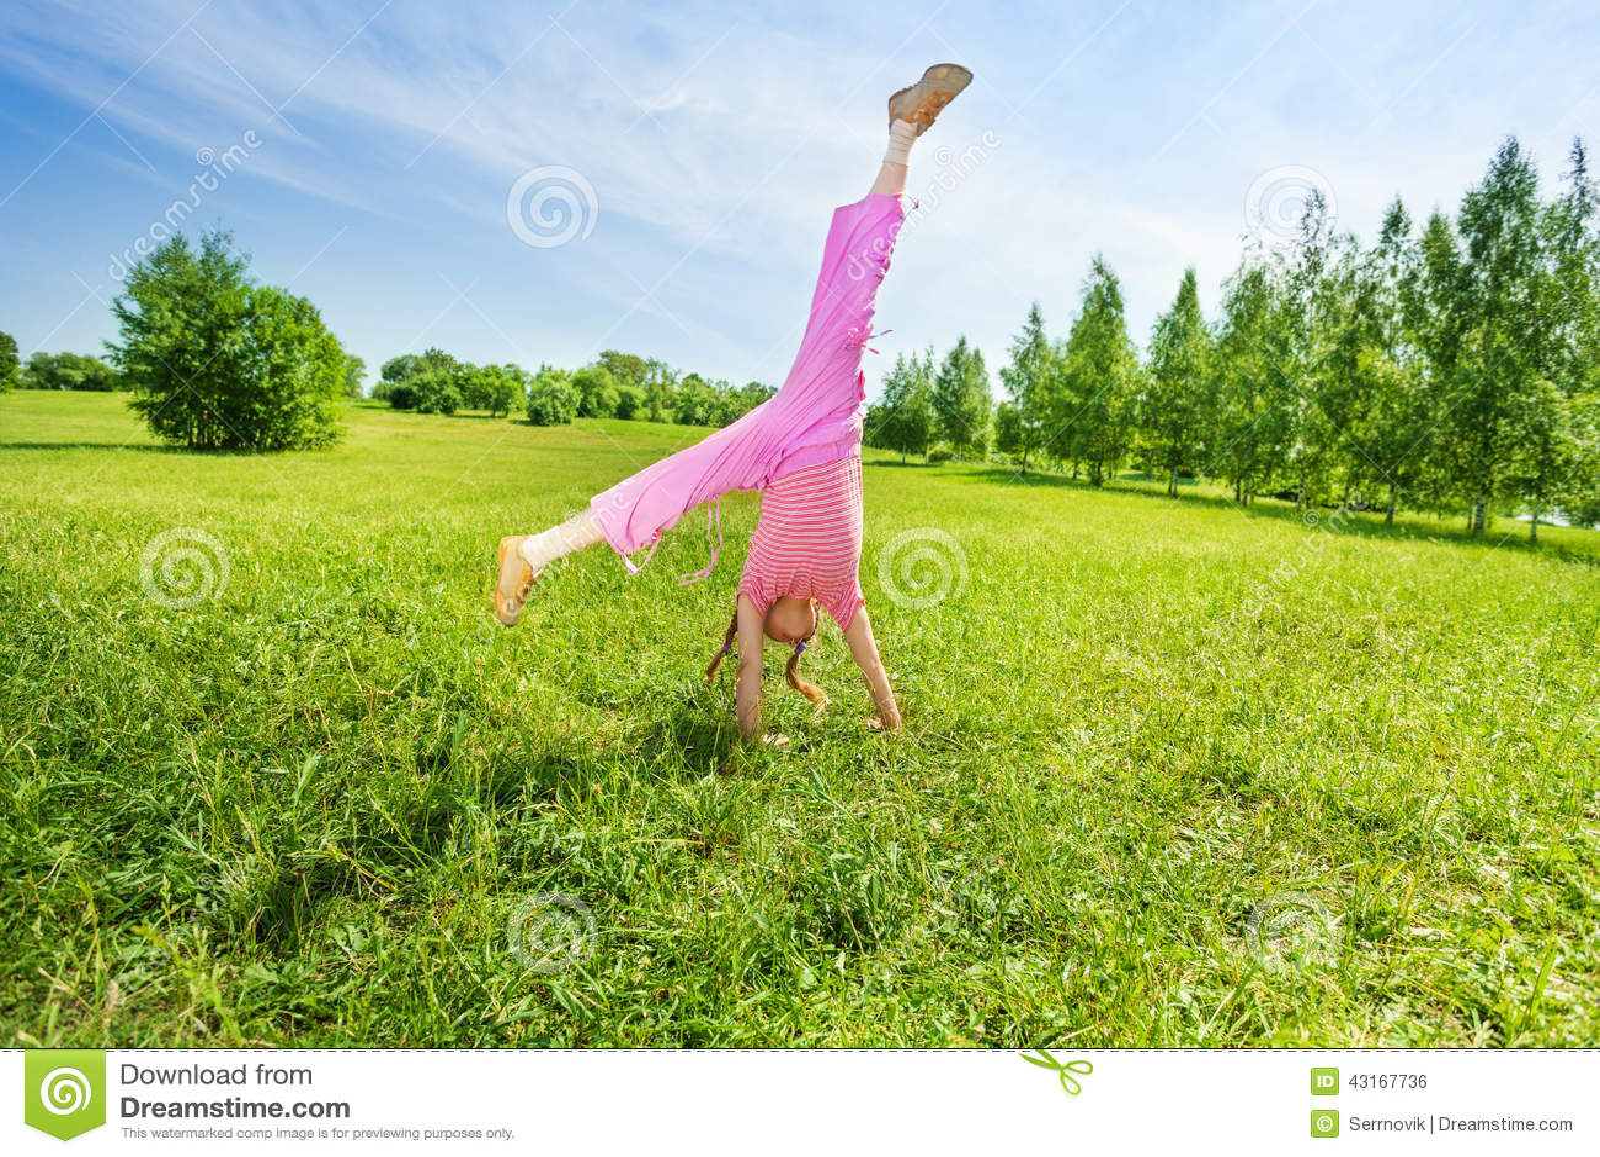 Active Girl Making Flip On Grass Outside Stock Photo ...